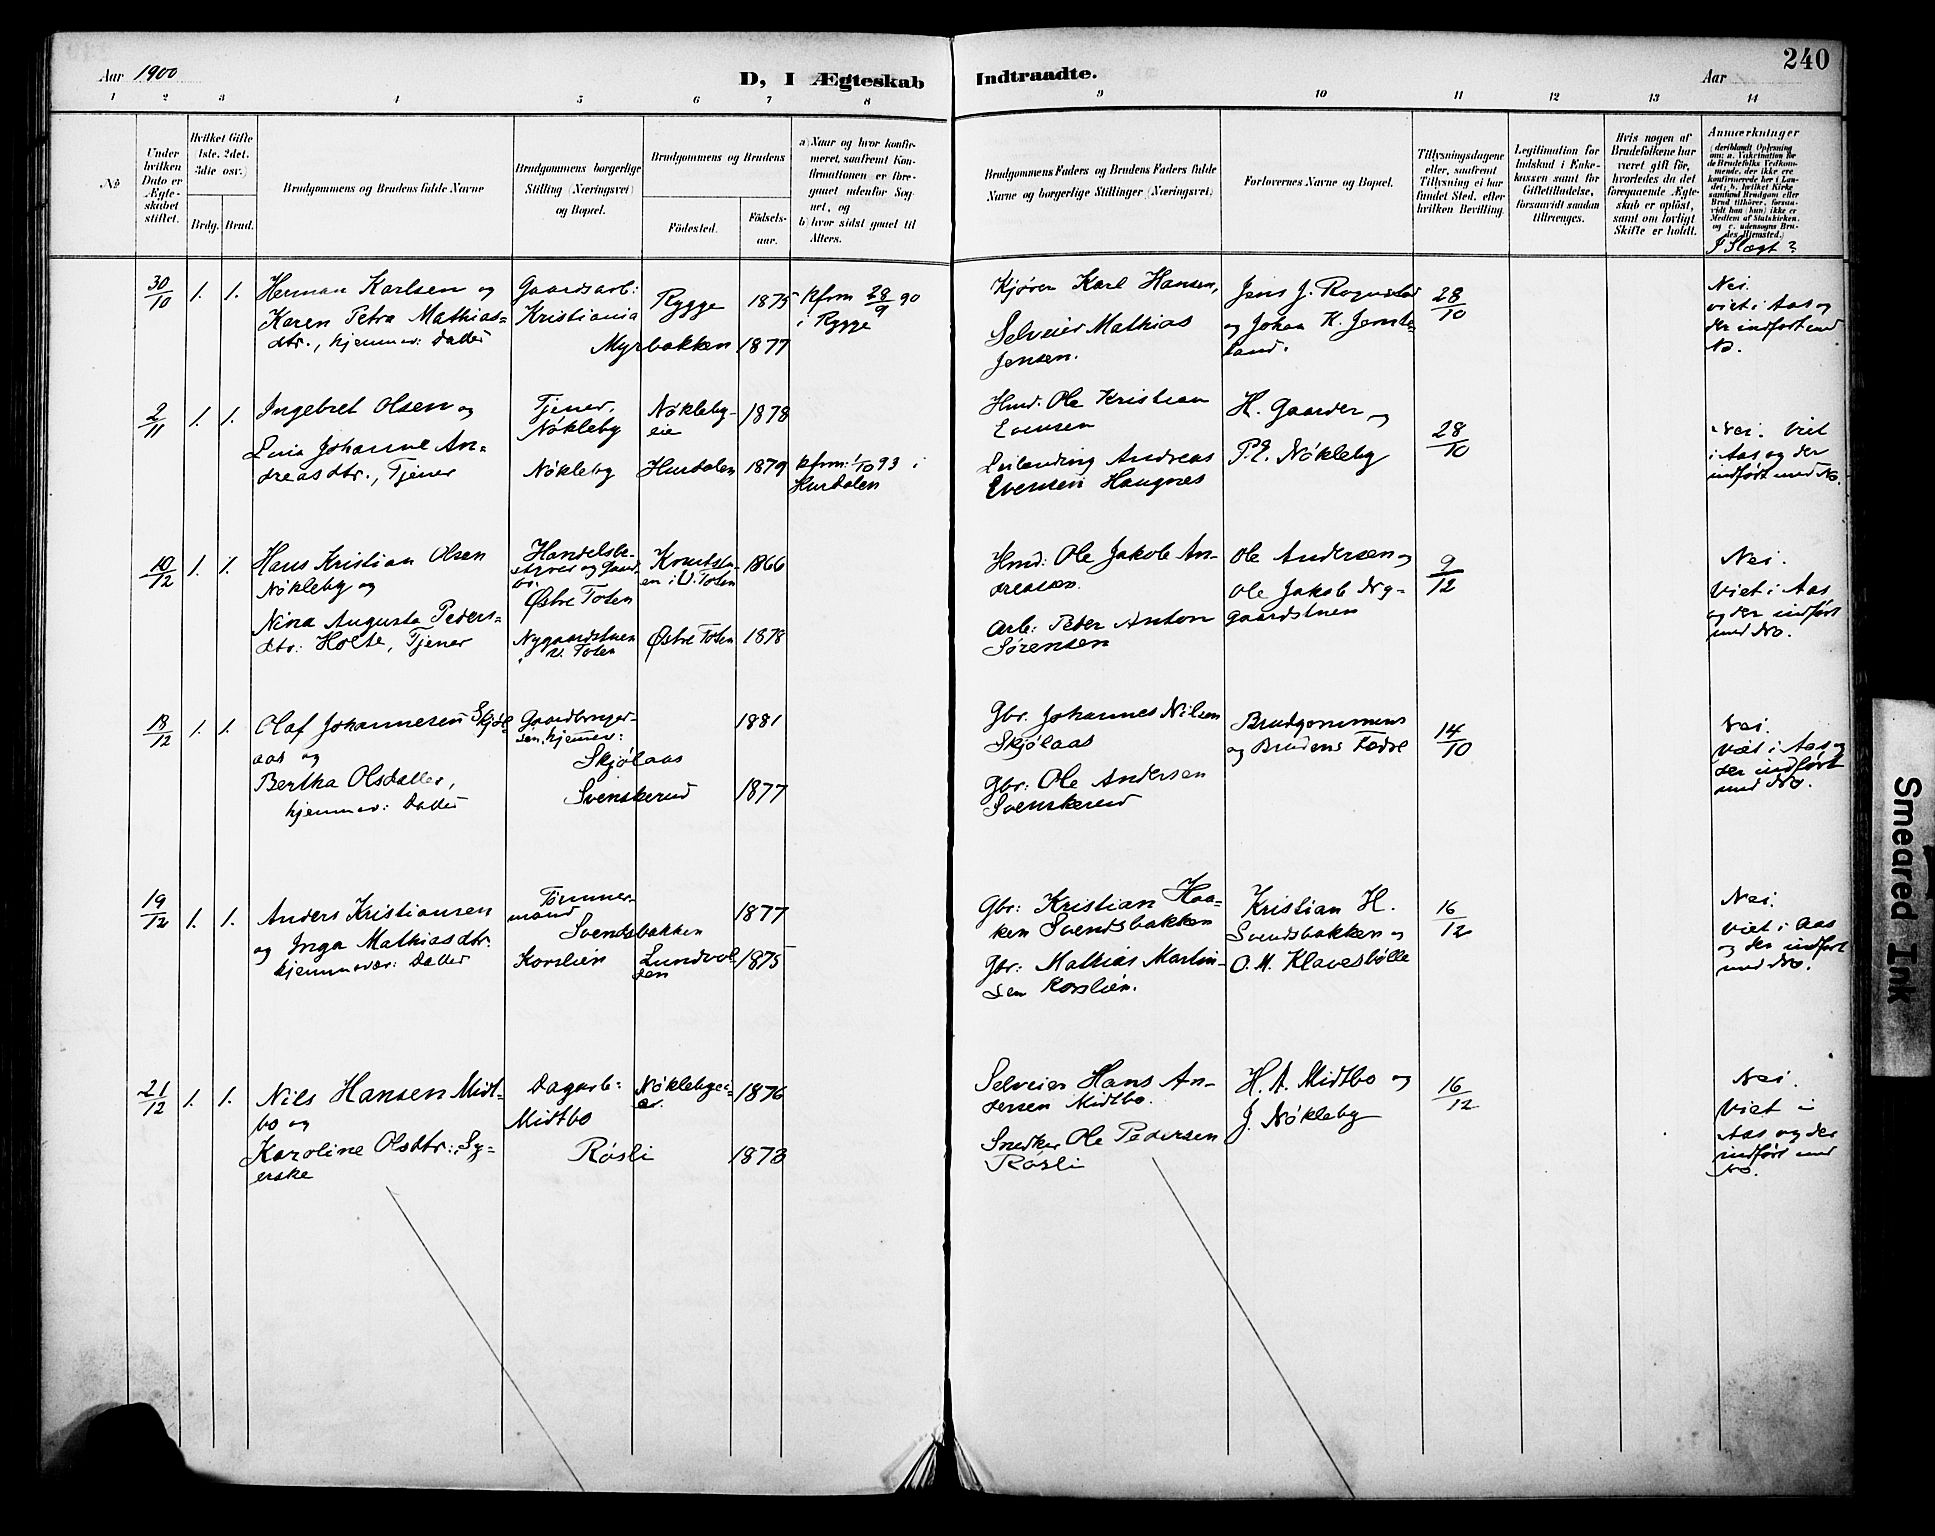 SAH, Vestre Toten prestekontor, H/Ha/Haa/L0013: Ministerialbok nr. 13, 1895-1911, s. 240